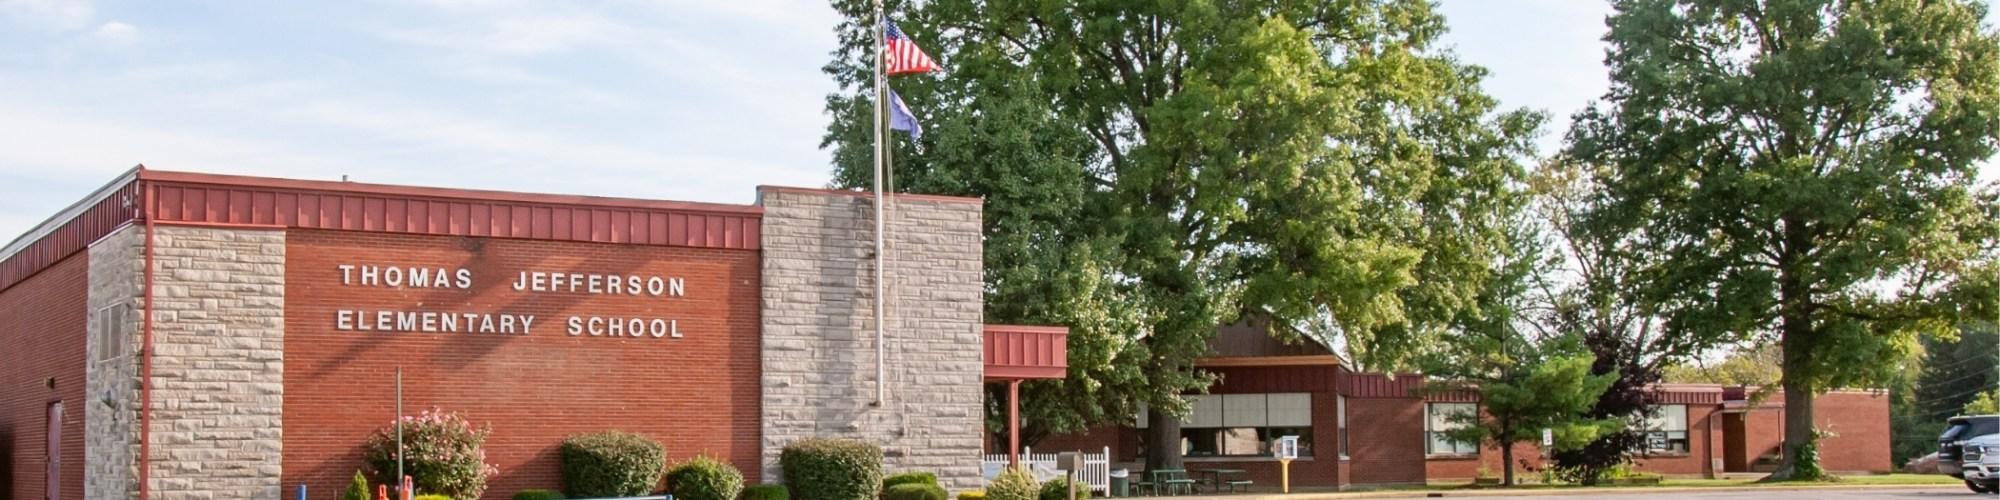 Front of Thomas Jefferson Elementary